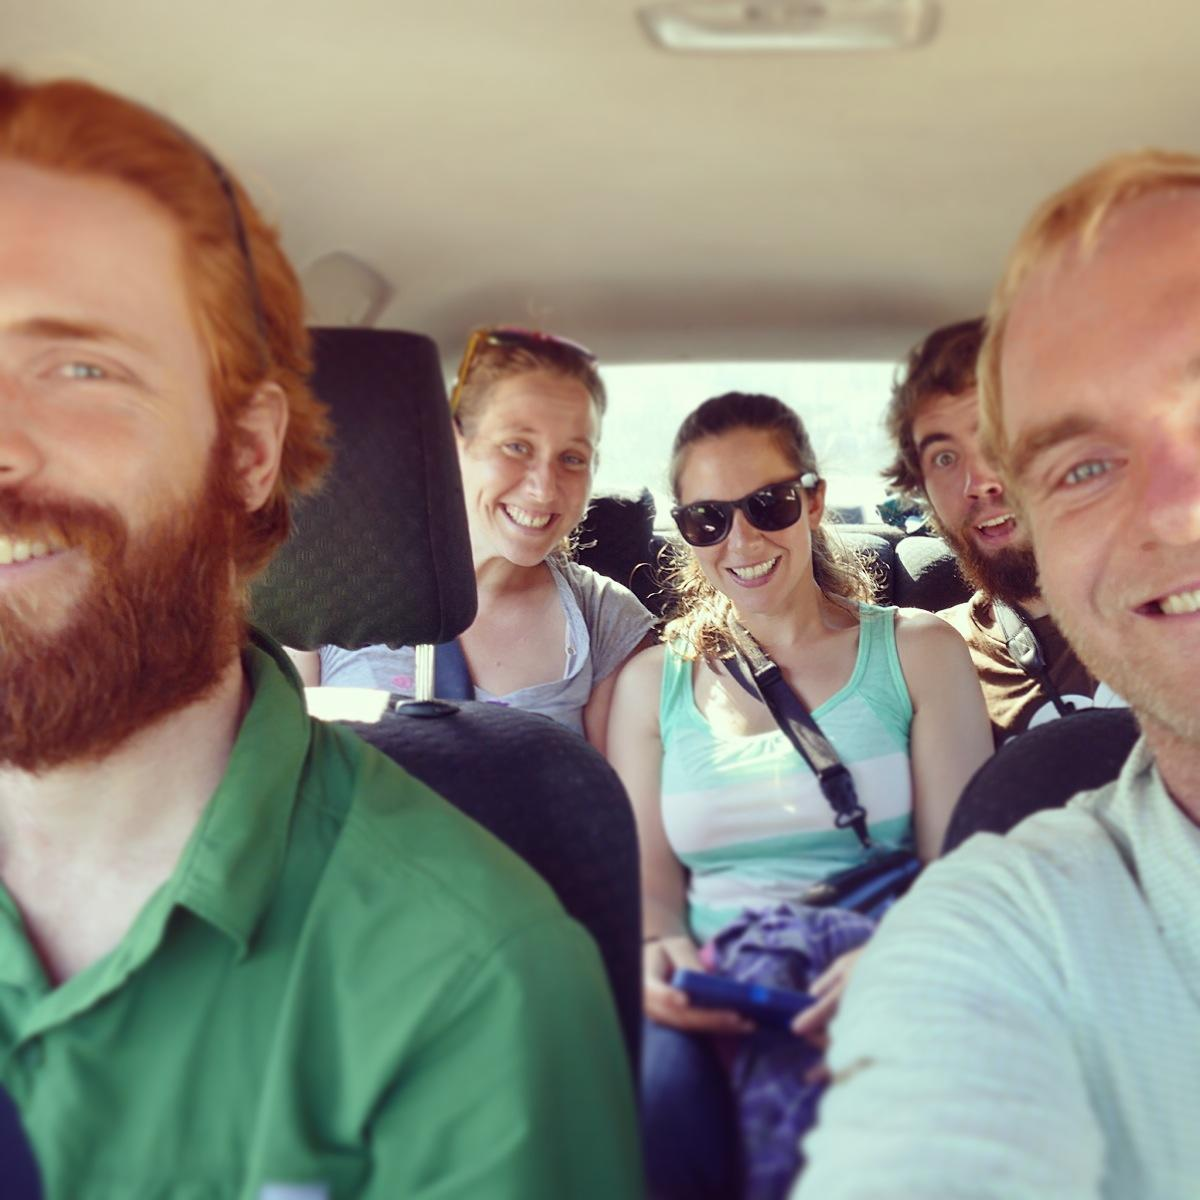 Jay and Noah (front) and Barbara, Liz, and Tom (back) ride toward the next birding spot. Noah Strycker